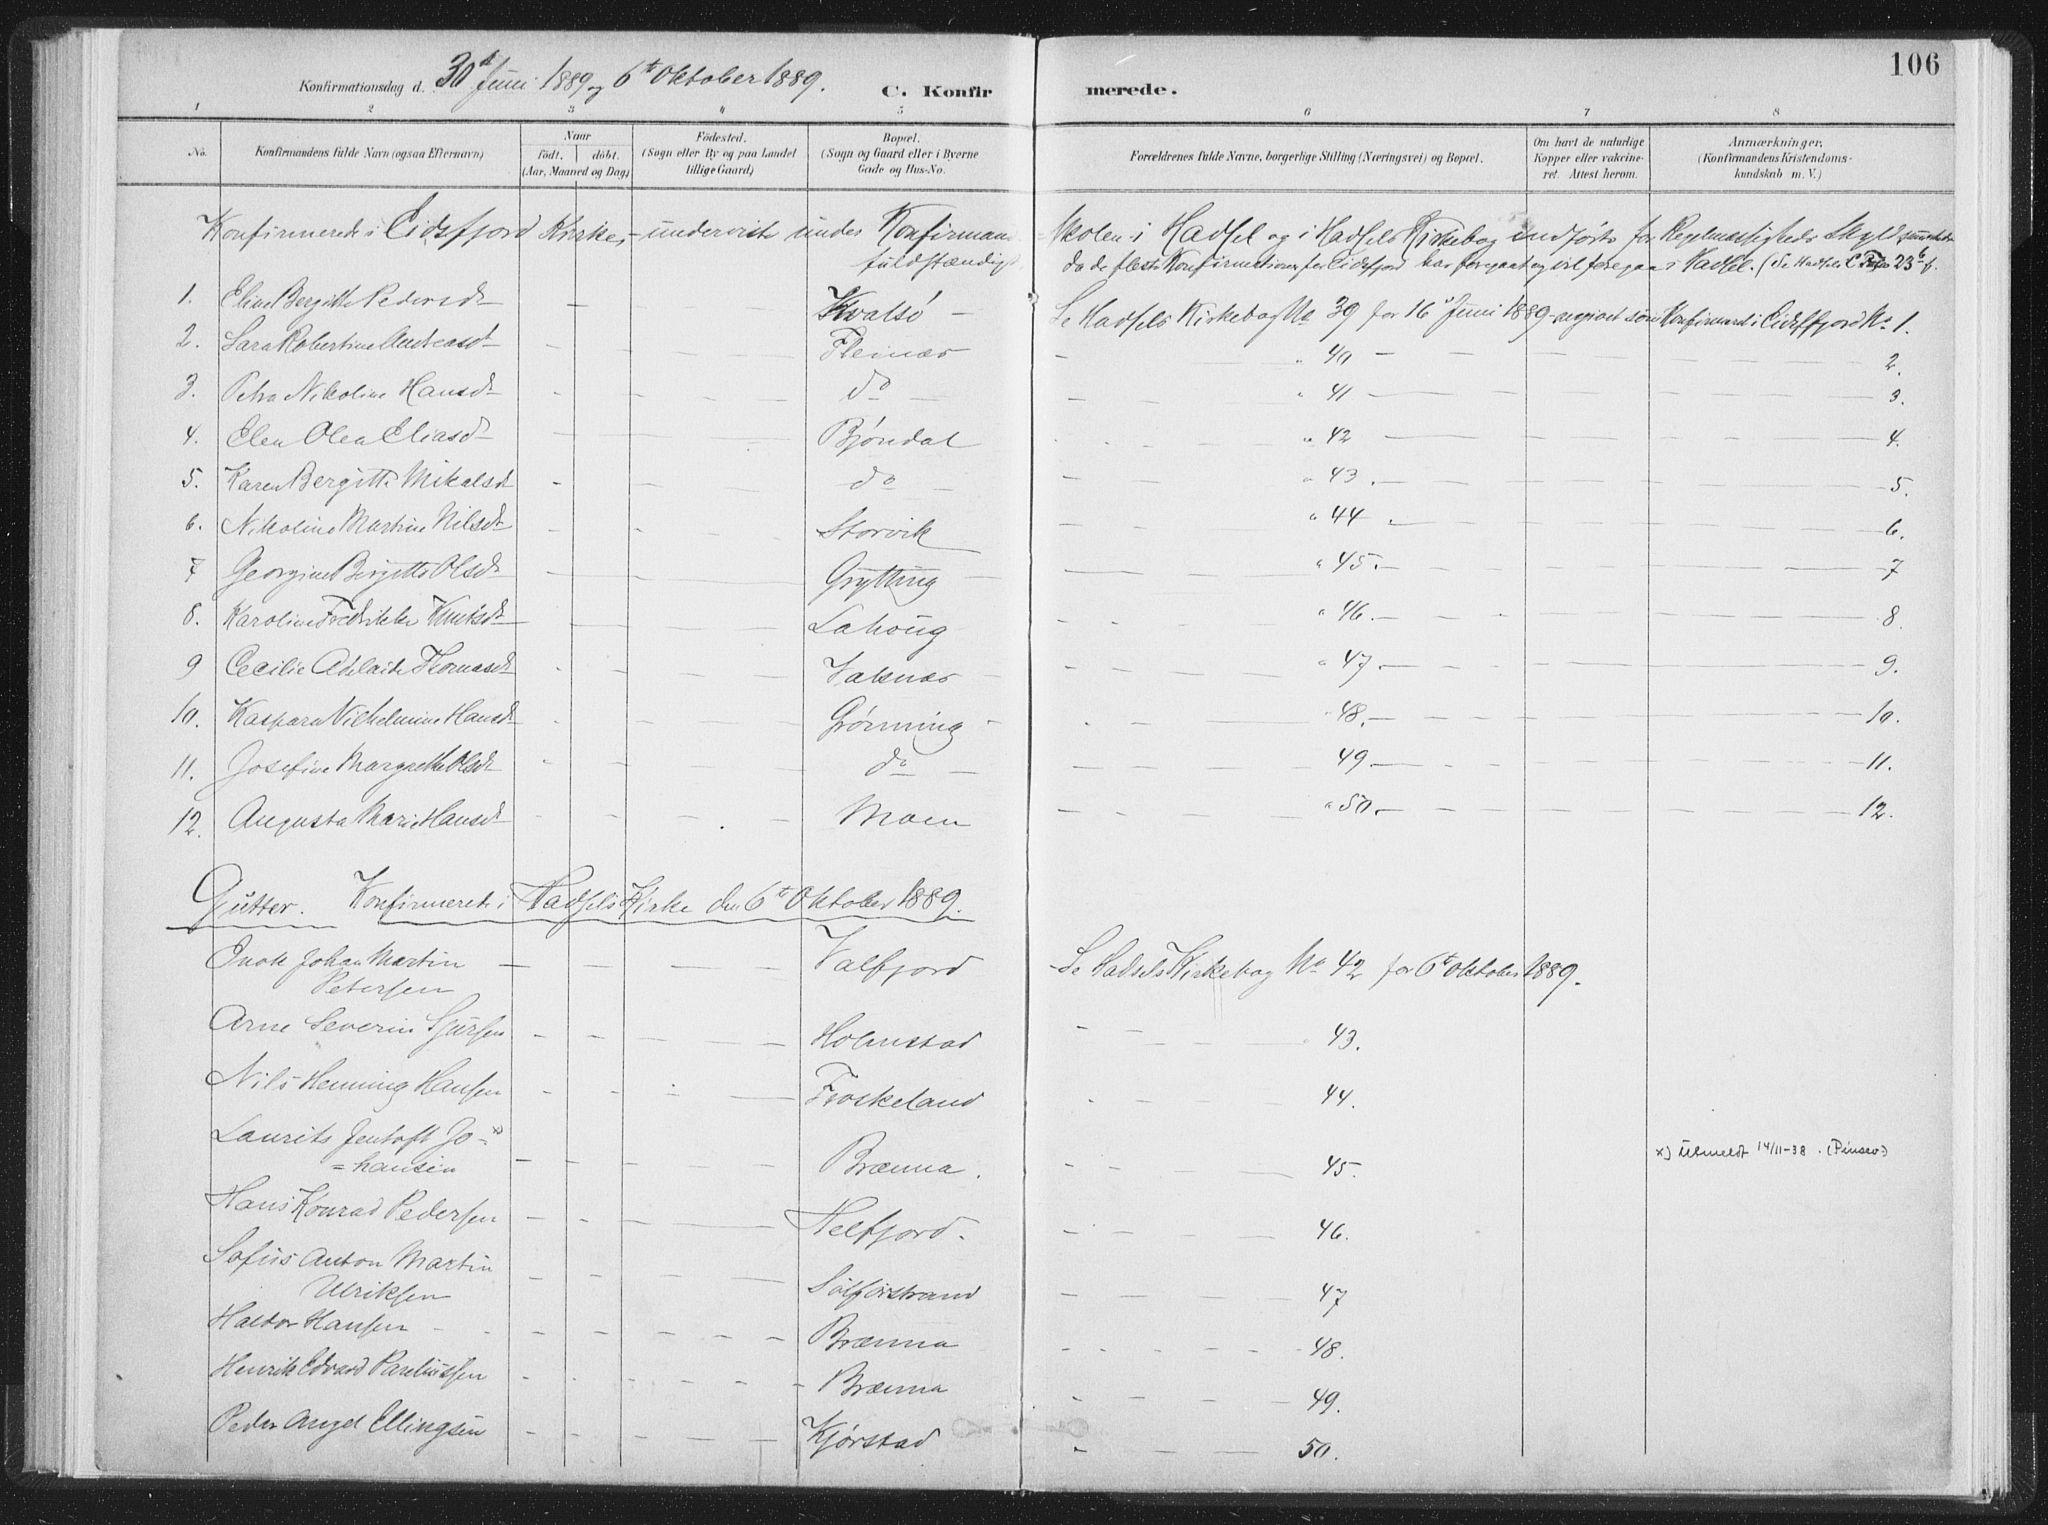 SAT, Ministerialprotokoller, klokkerbøker og fødselsregistre - Nordland, 890/L1286: Ministerialbok nr. 890A01, 1882-1902, s. 106